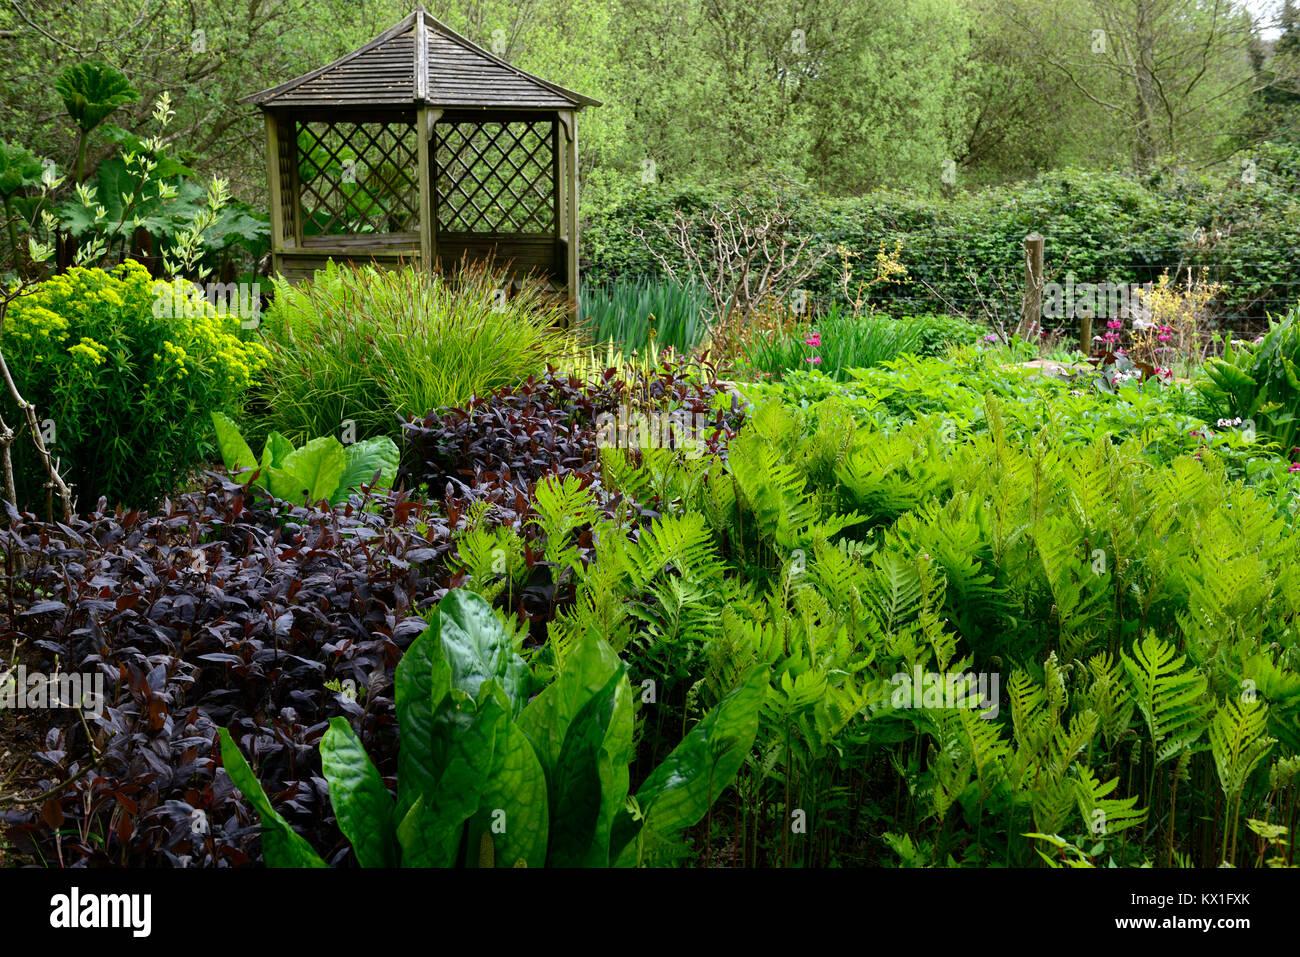 onoclea sensibilis,sensitive fern,Lysichiton americanus,skunk cabbage,damp,boggy,moist,garden,pagoda,leaves,foliage,RM floral Stock Photo